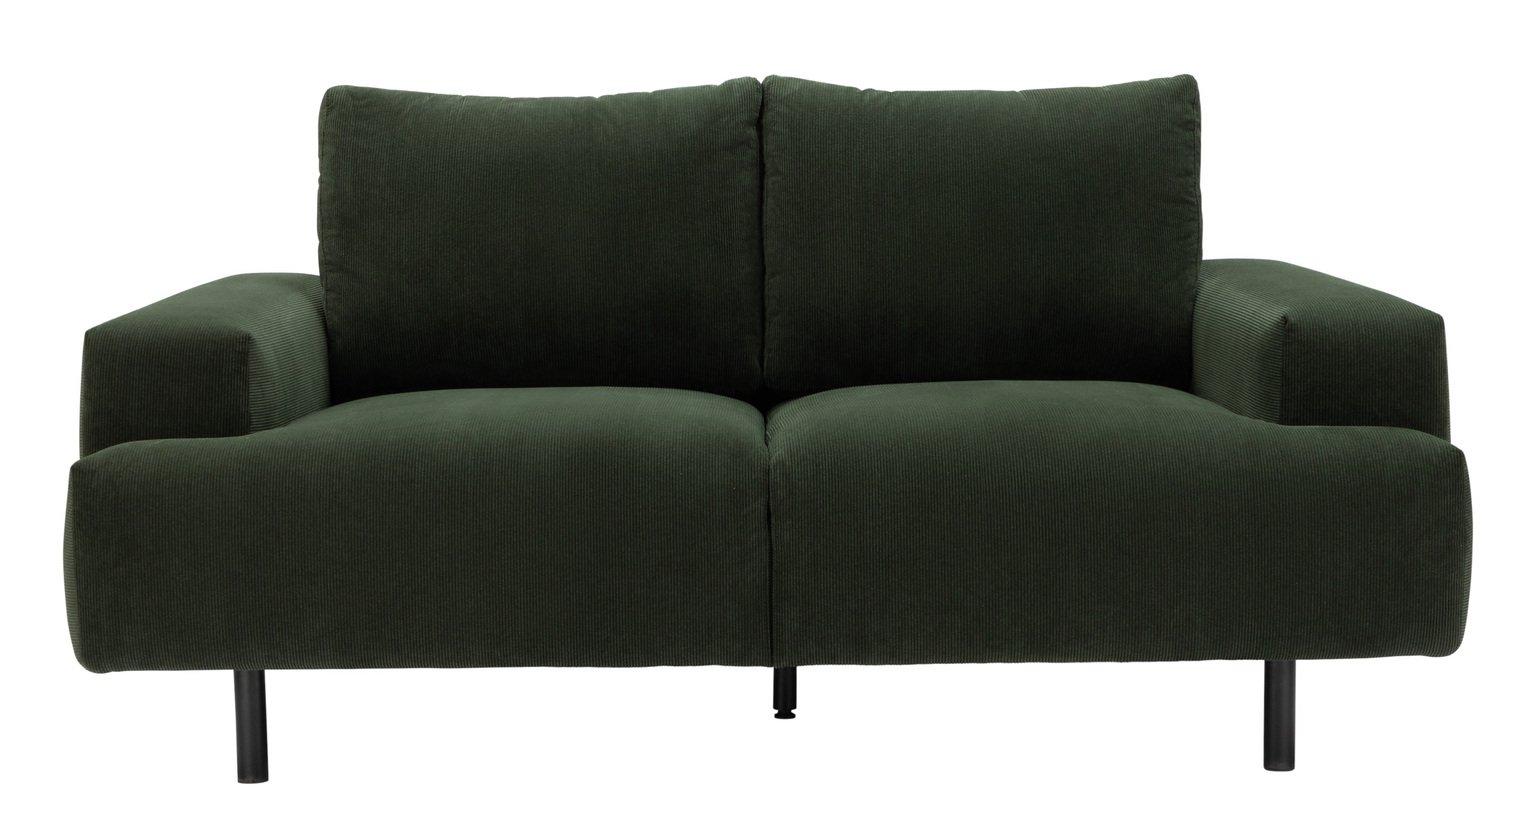 Habitat Julien 2 Seater Fabic Sofa - Dark Green